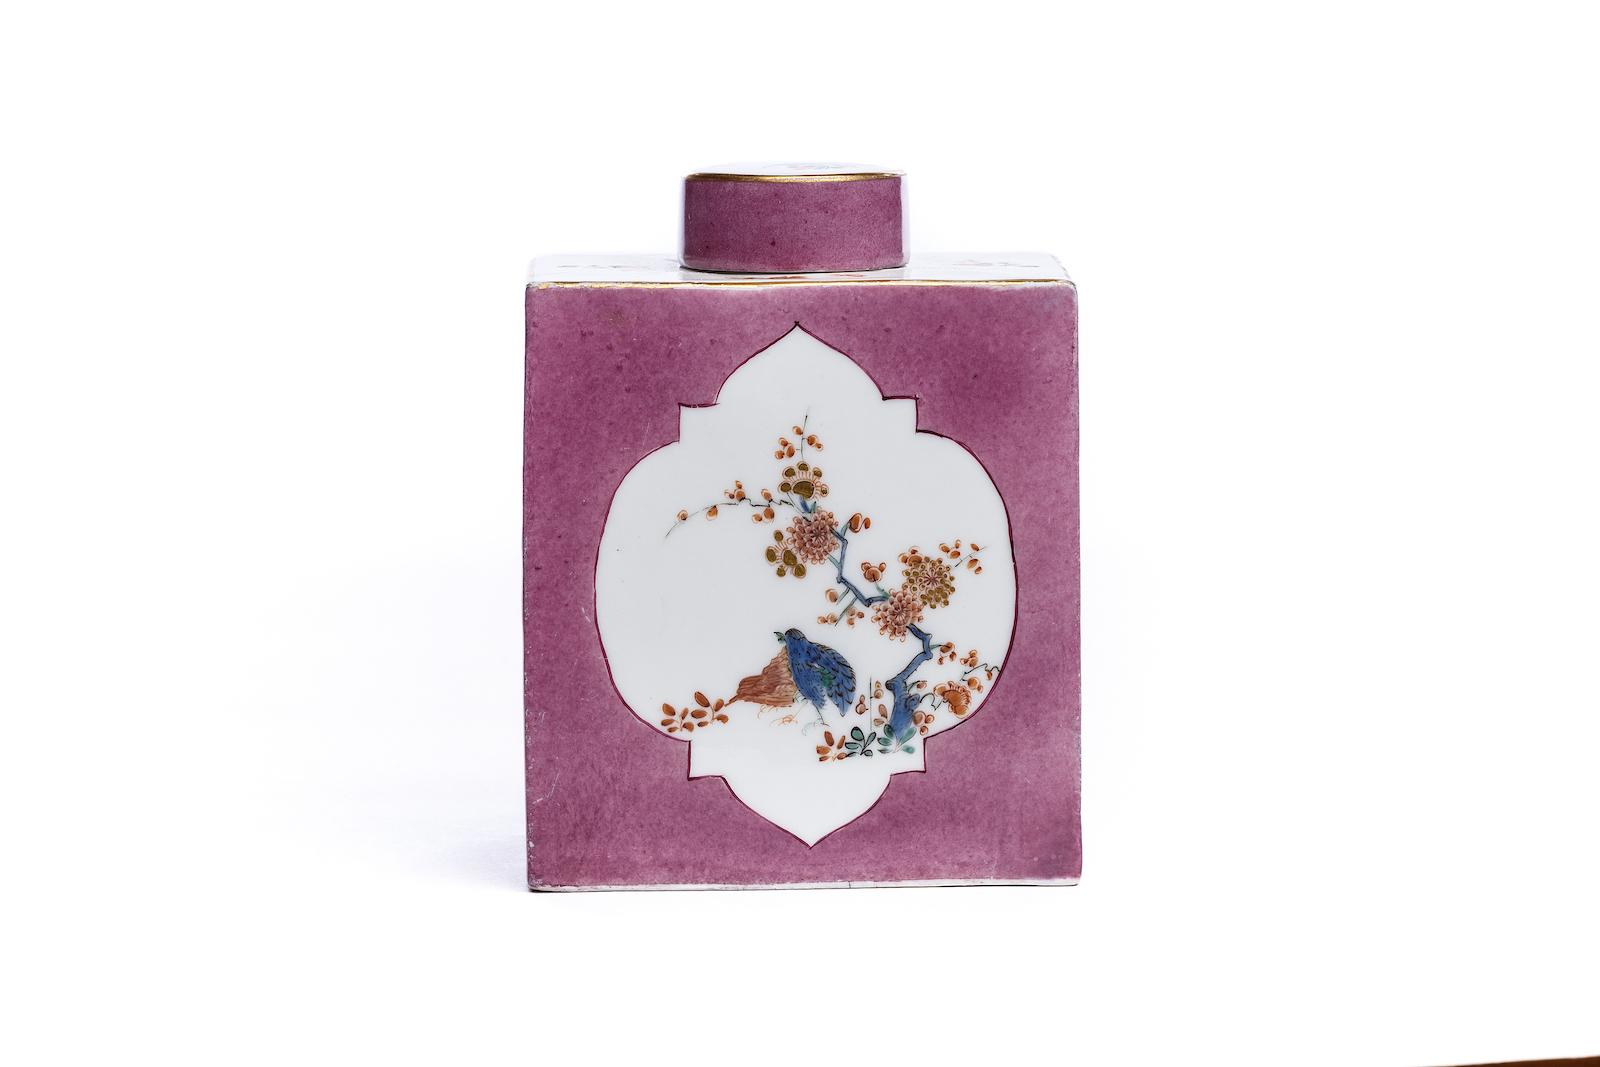 #160 Teedose, Meissen 1730 | Tea box, Meissen 1730 Image